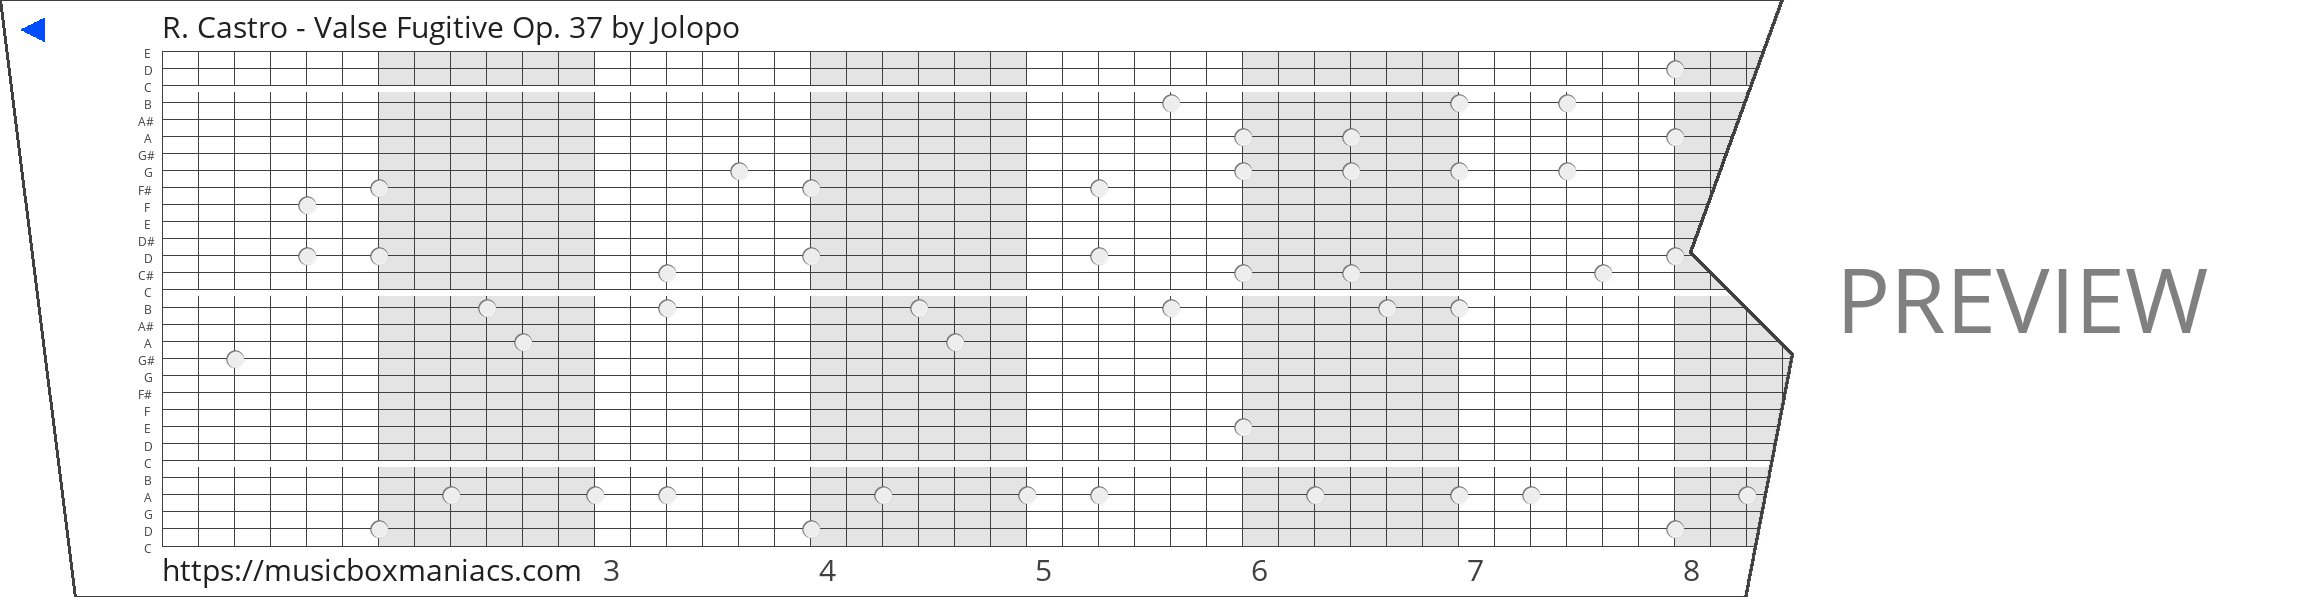 R. Castro - Valse Fugitive Op. 37 30 note music box paper strip